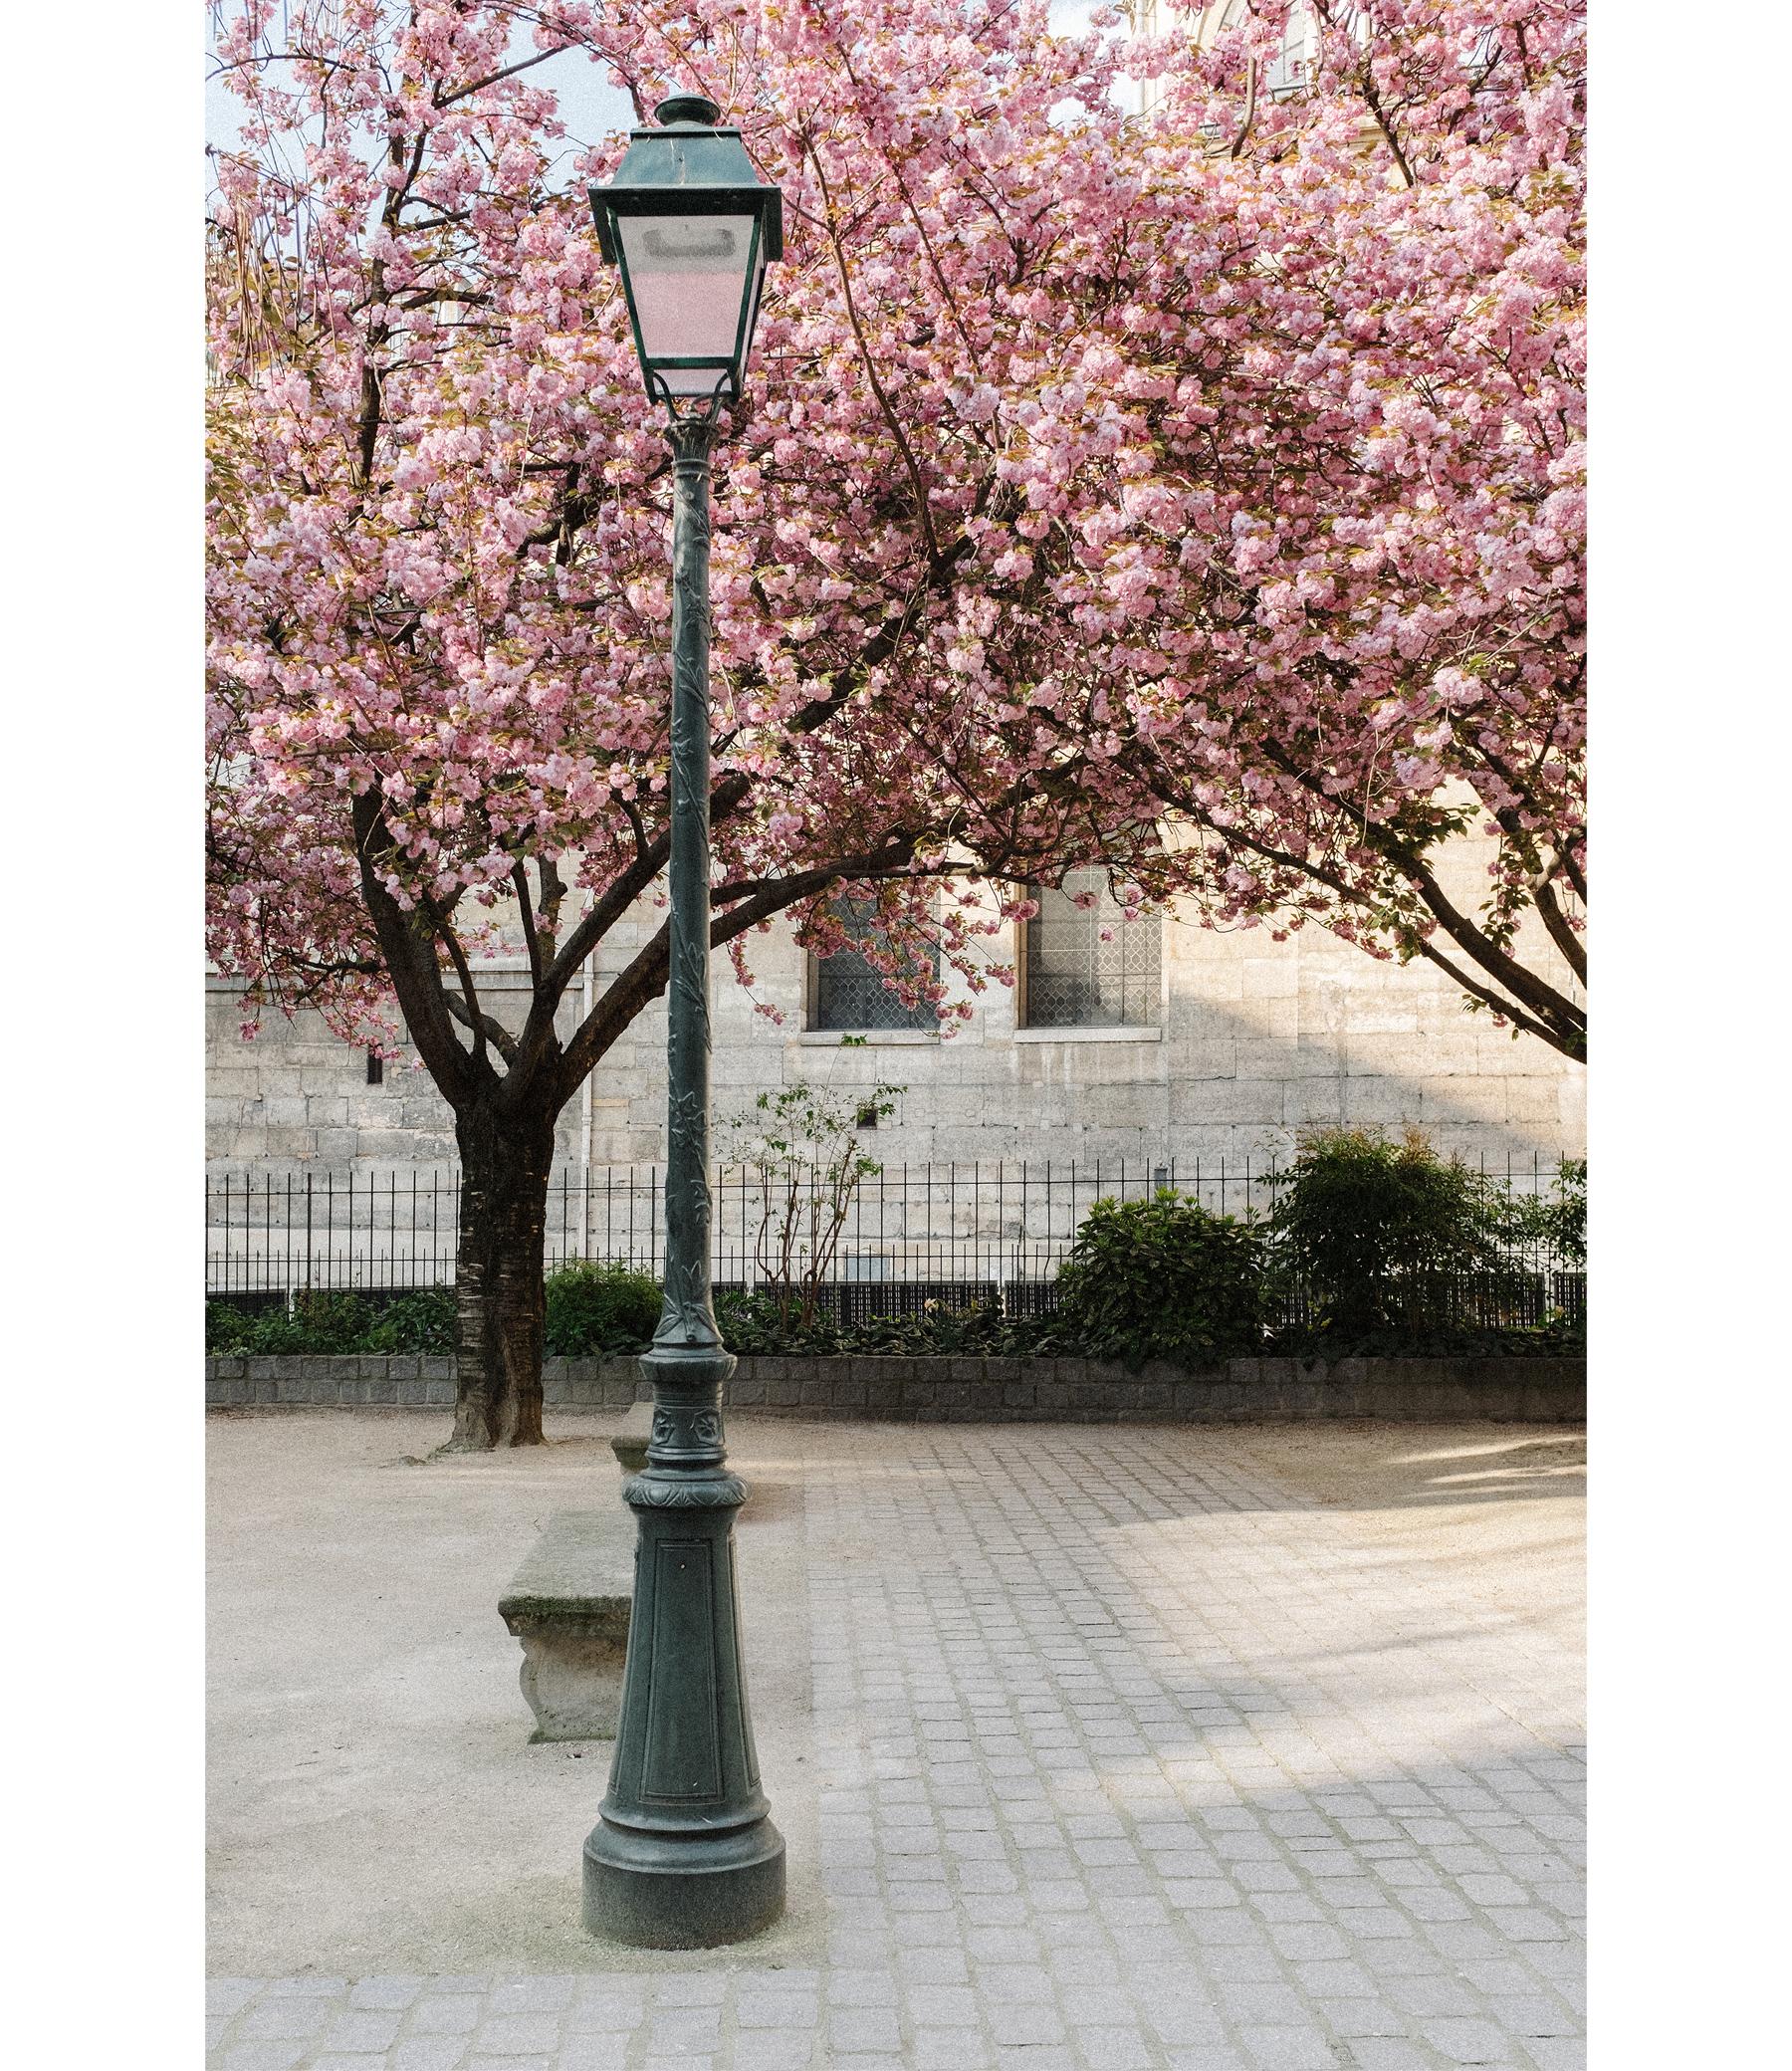 Paris_Spring_CarinOlsson.jpg